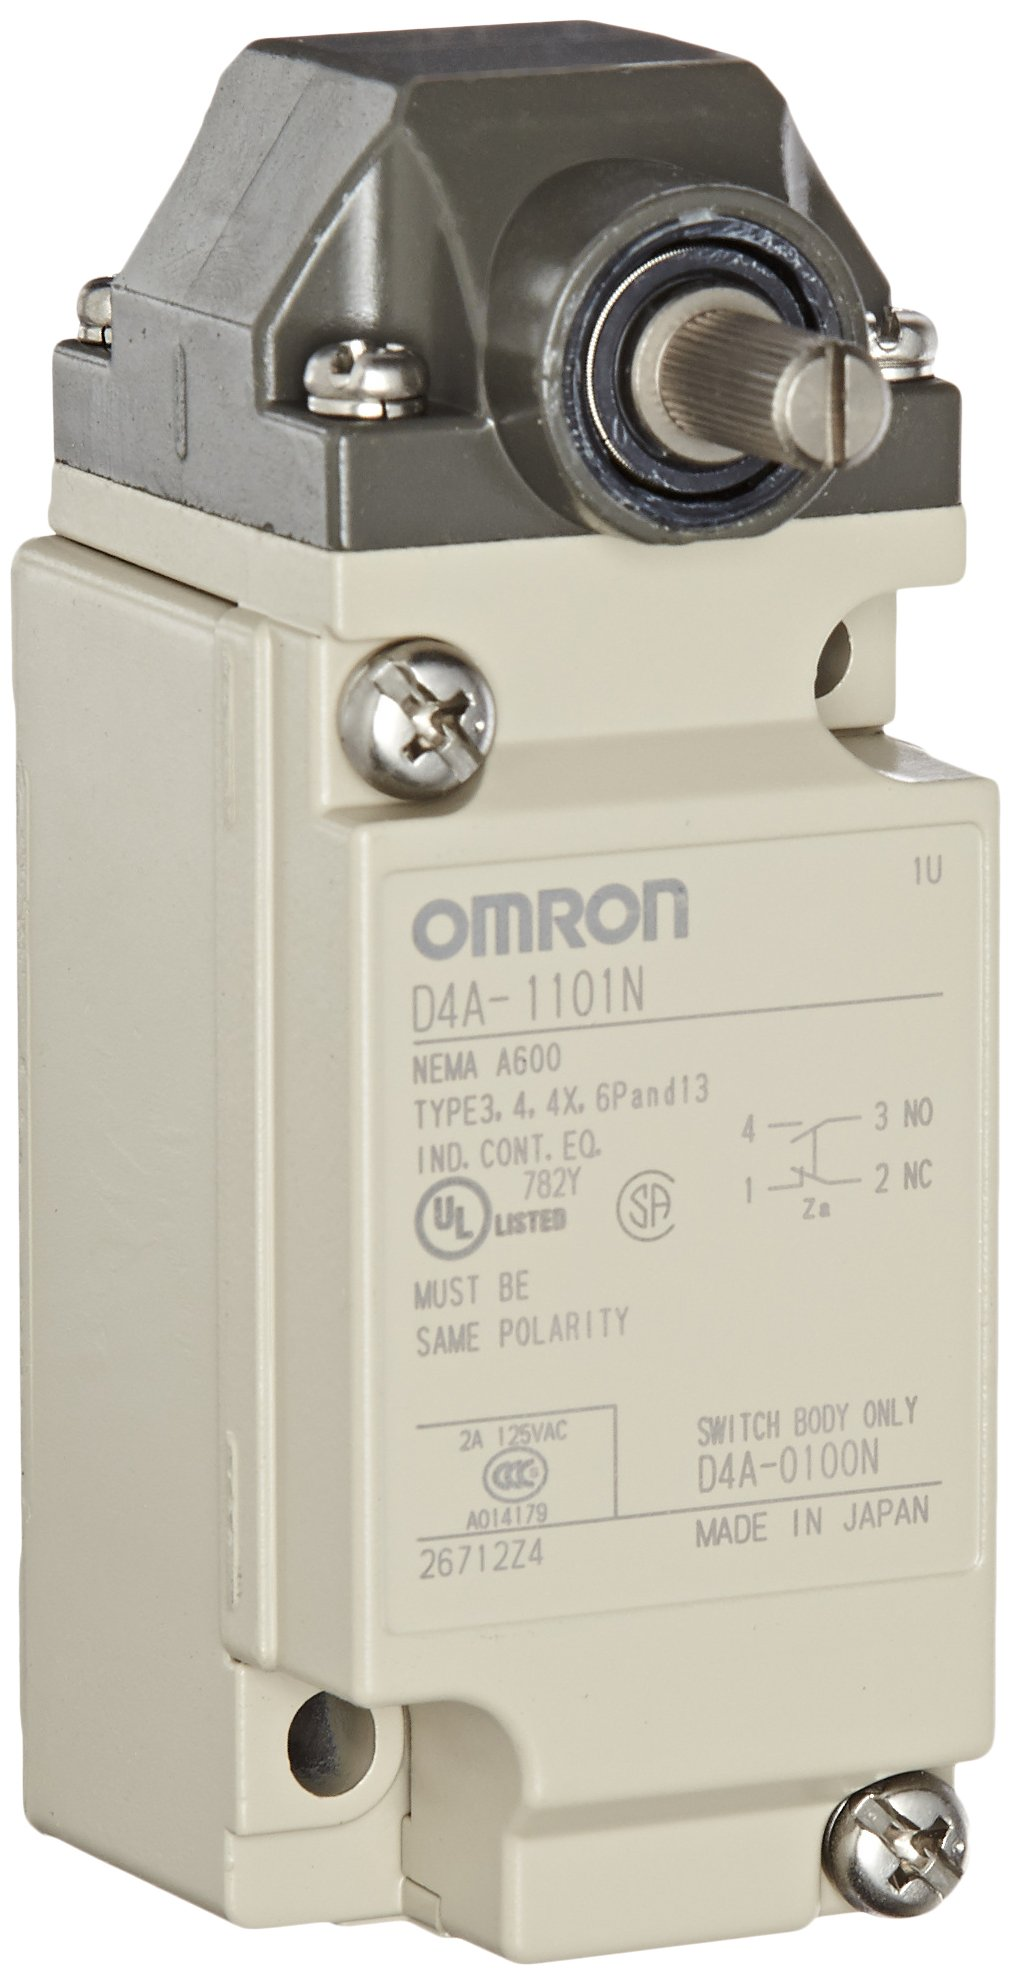 Omron D4A-1101-N General Purpose Limit Switch, Roller Lever, Standard Type, 1/2-14 NPT Conduit Size, Single Pole Double Throw, Double Break